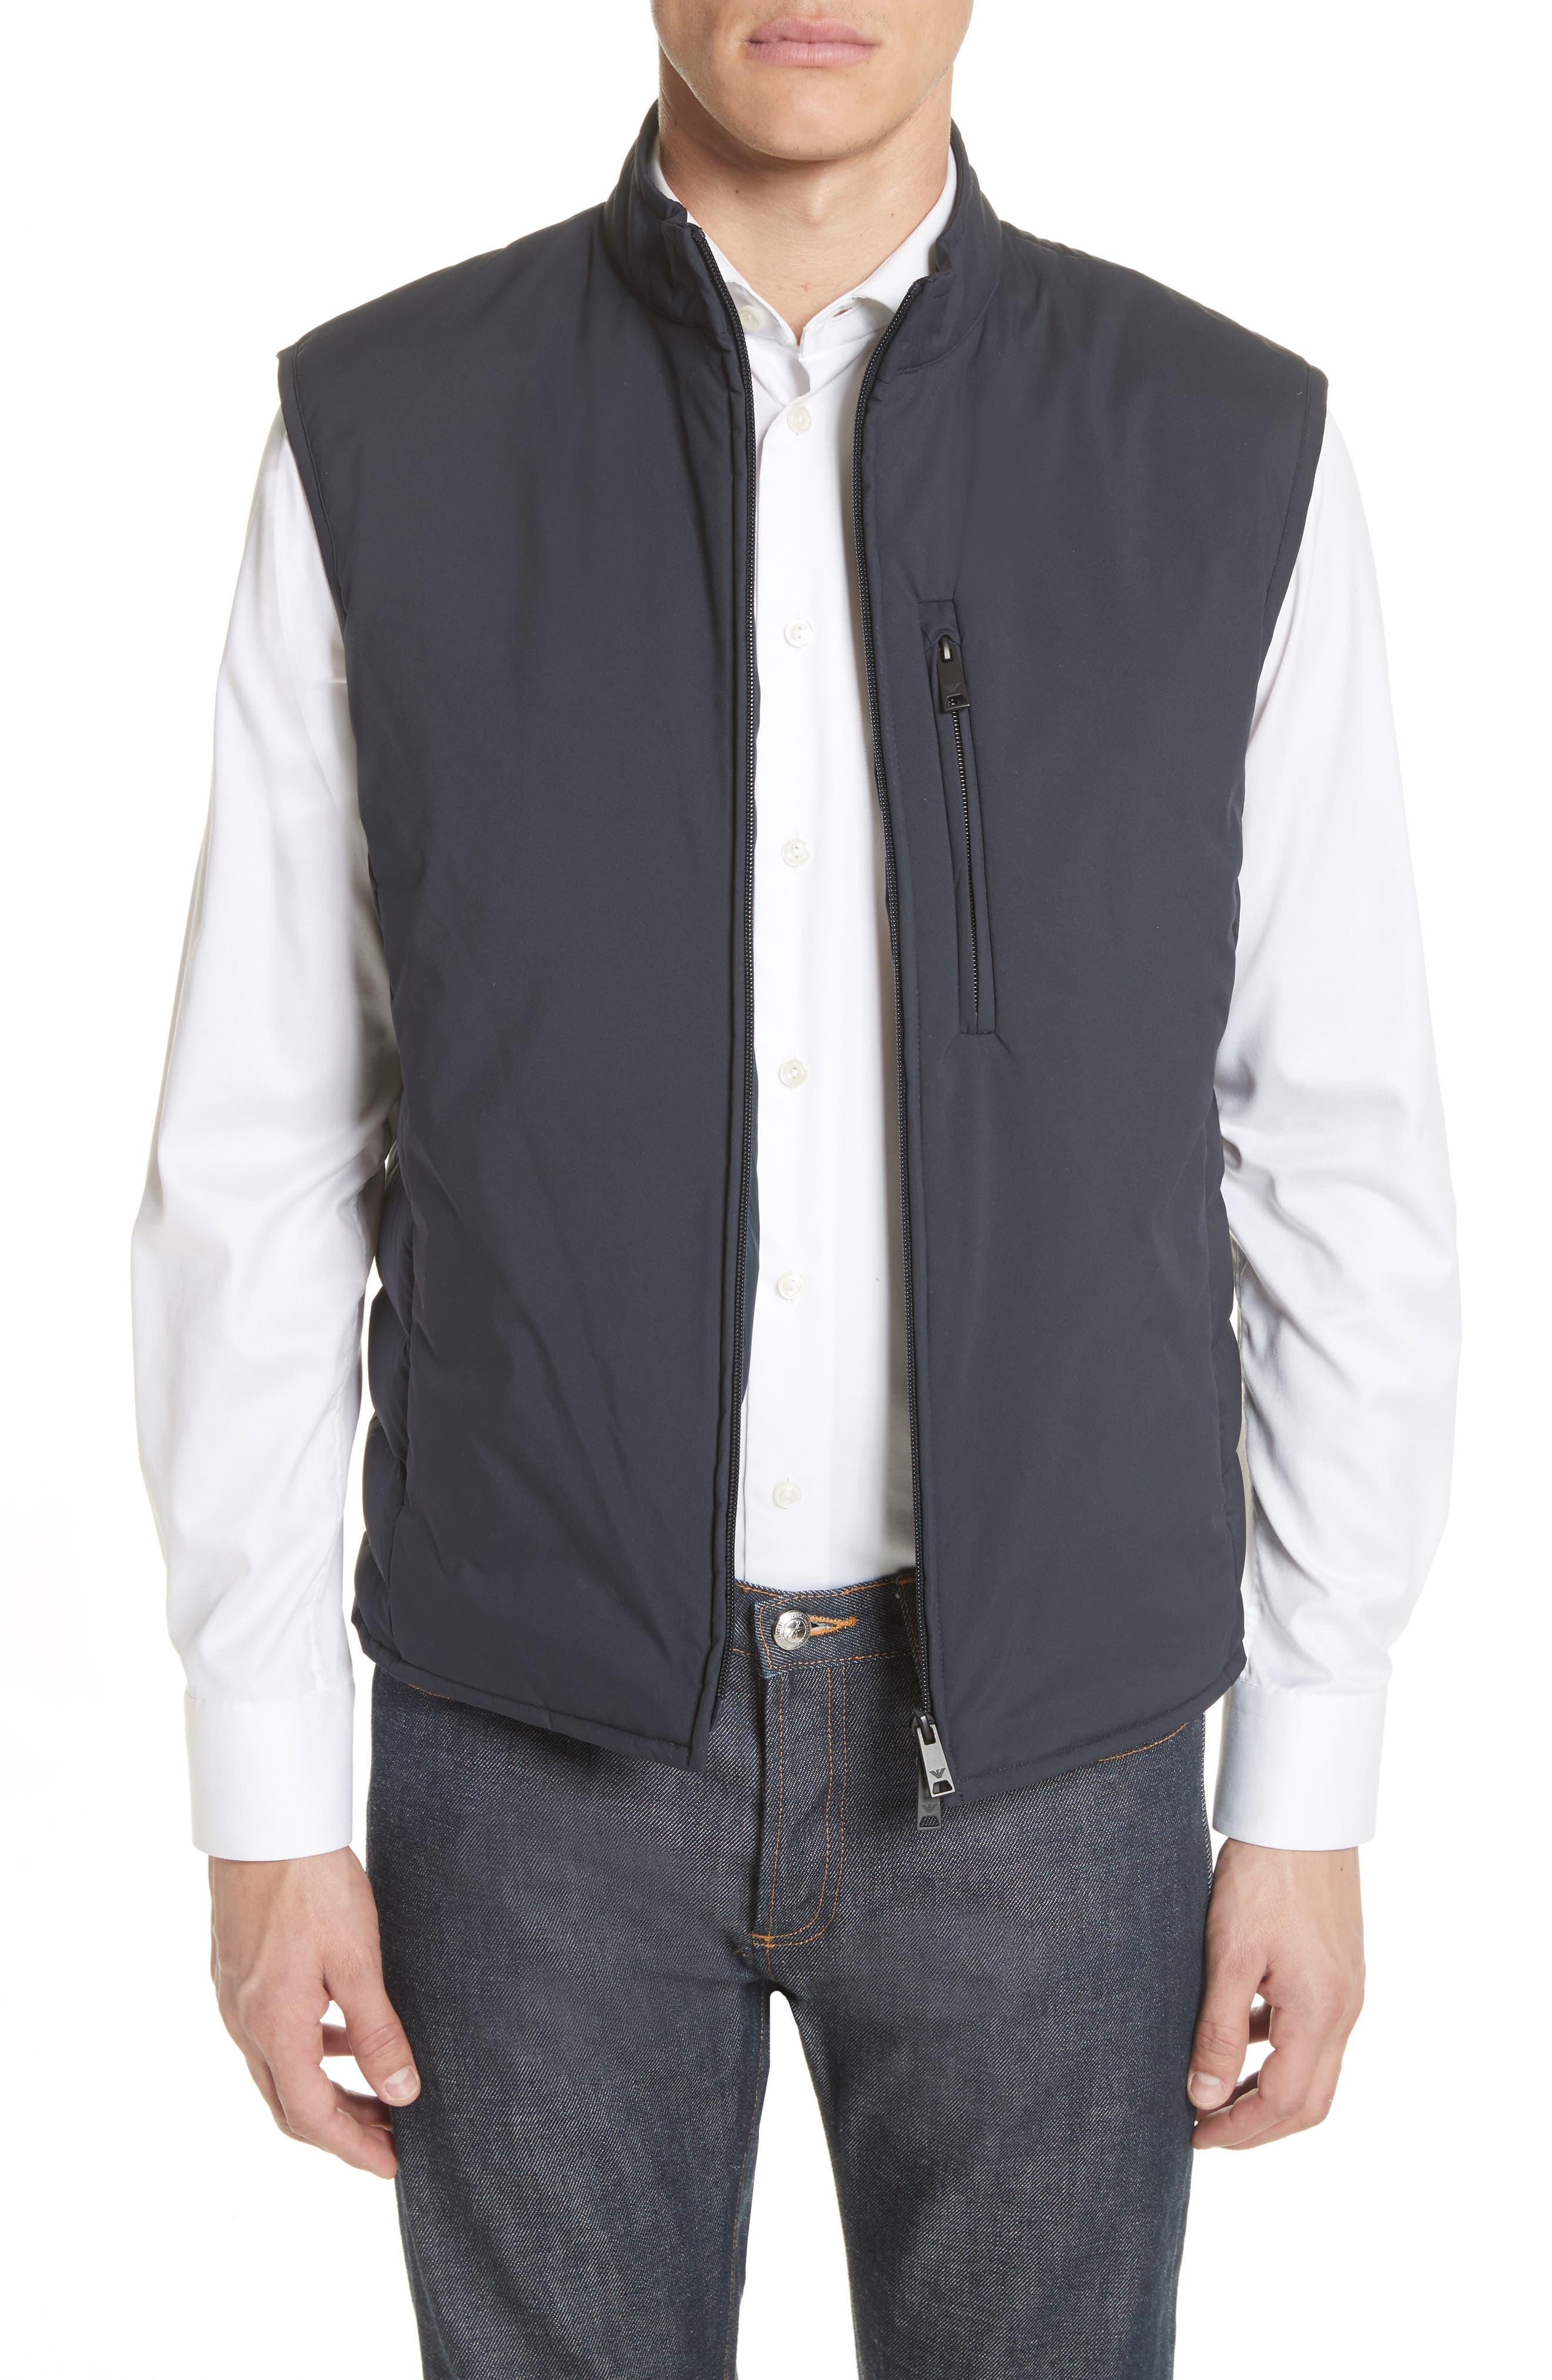 Main Image - Emporio Armani Quilted Microfiber Vest